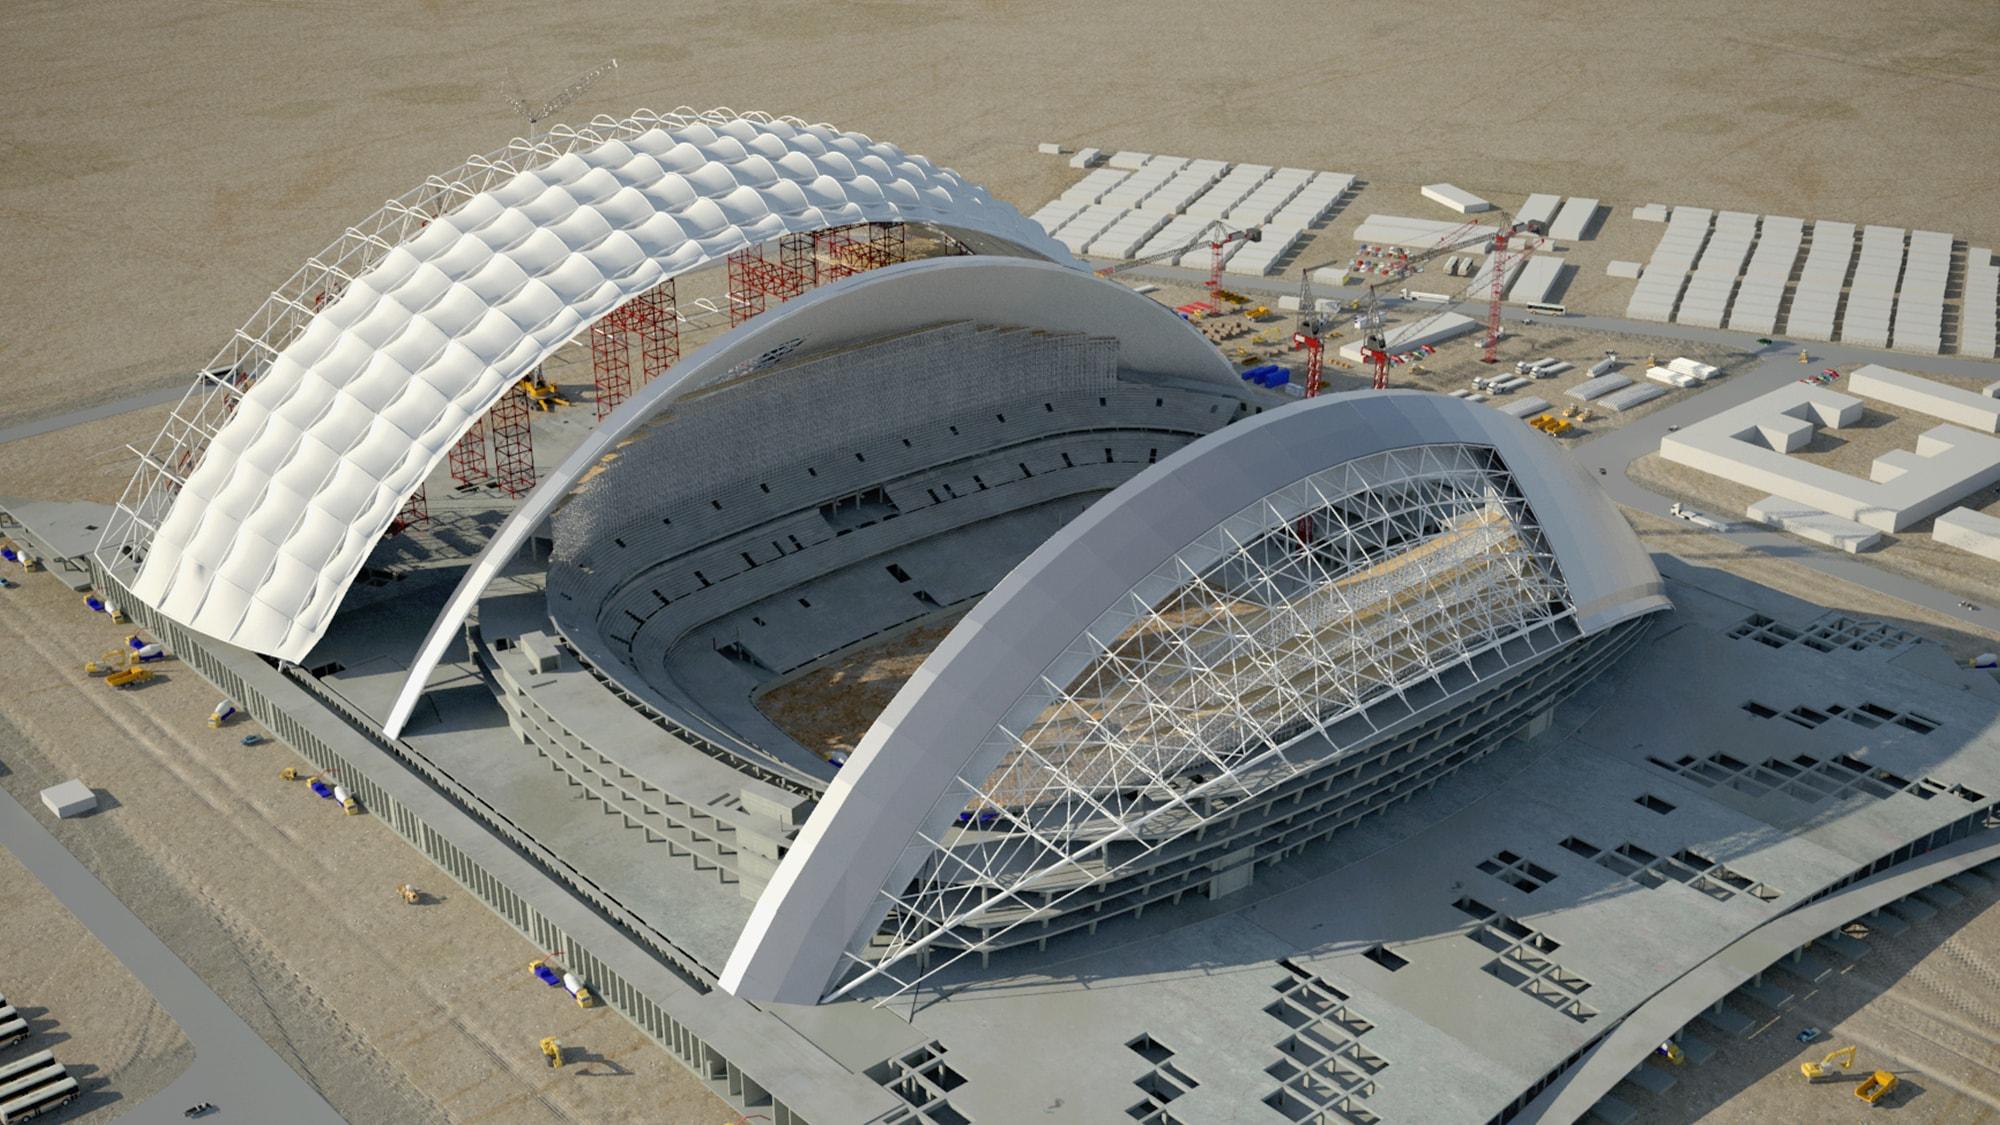 khalifa-stadium-image-1-min